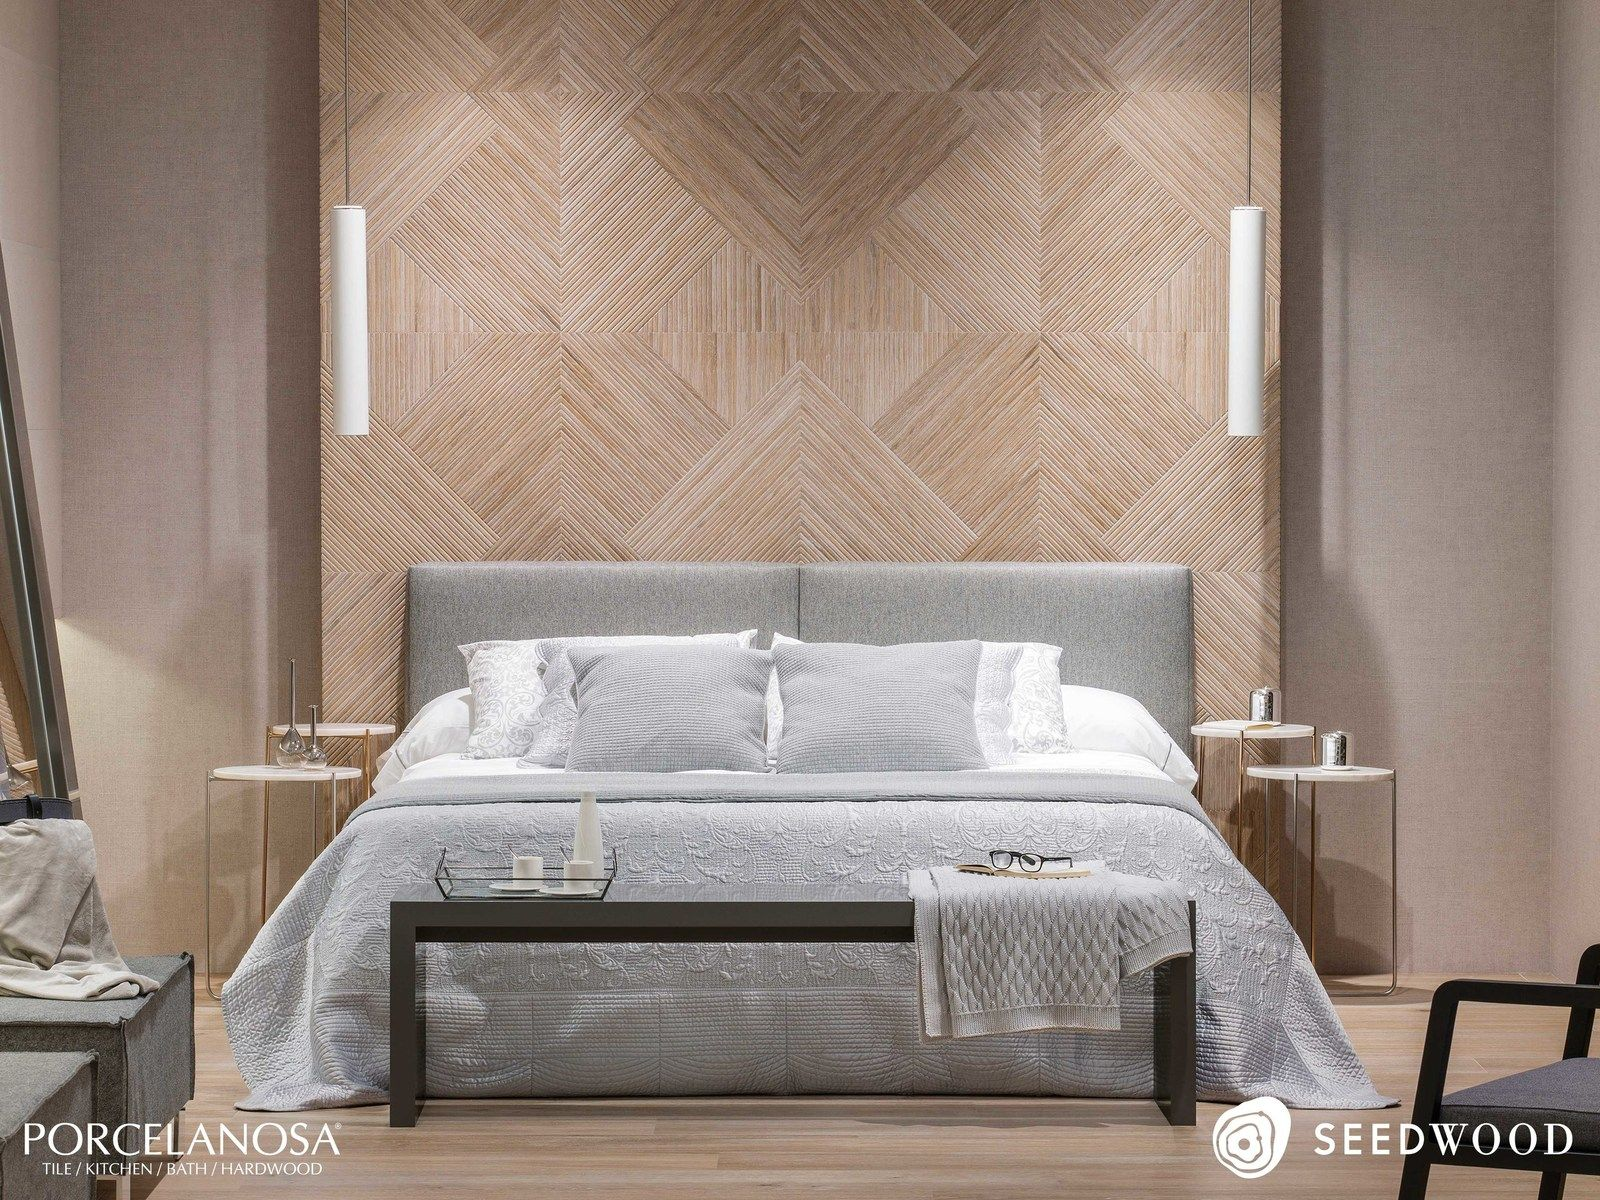 Image Result For Porcelanosa Minnesota Wood Effect Tiles Tile Bedroom Textured Wall Panels